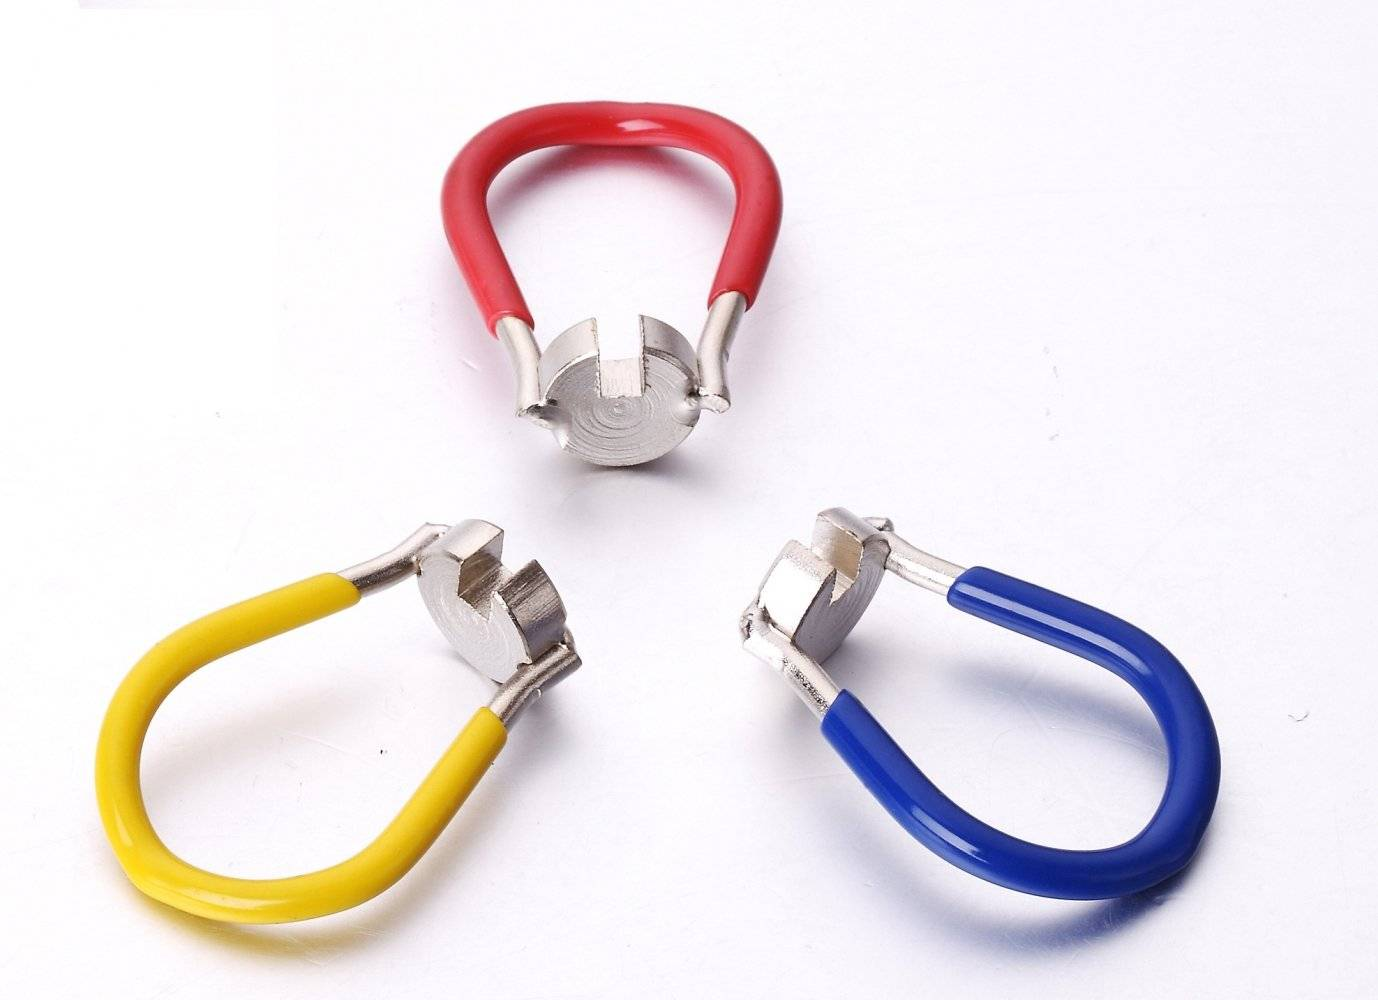 Ключ спицевой 14G Vinca, желтый, VSI 22 yellow, фото 1